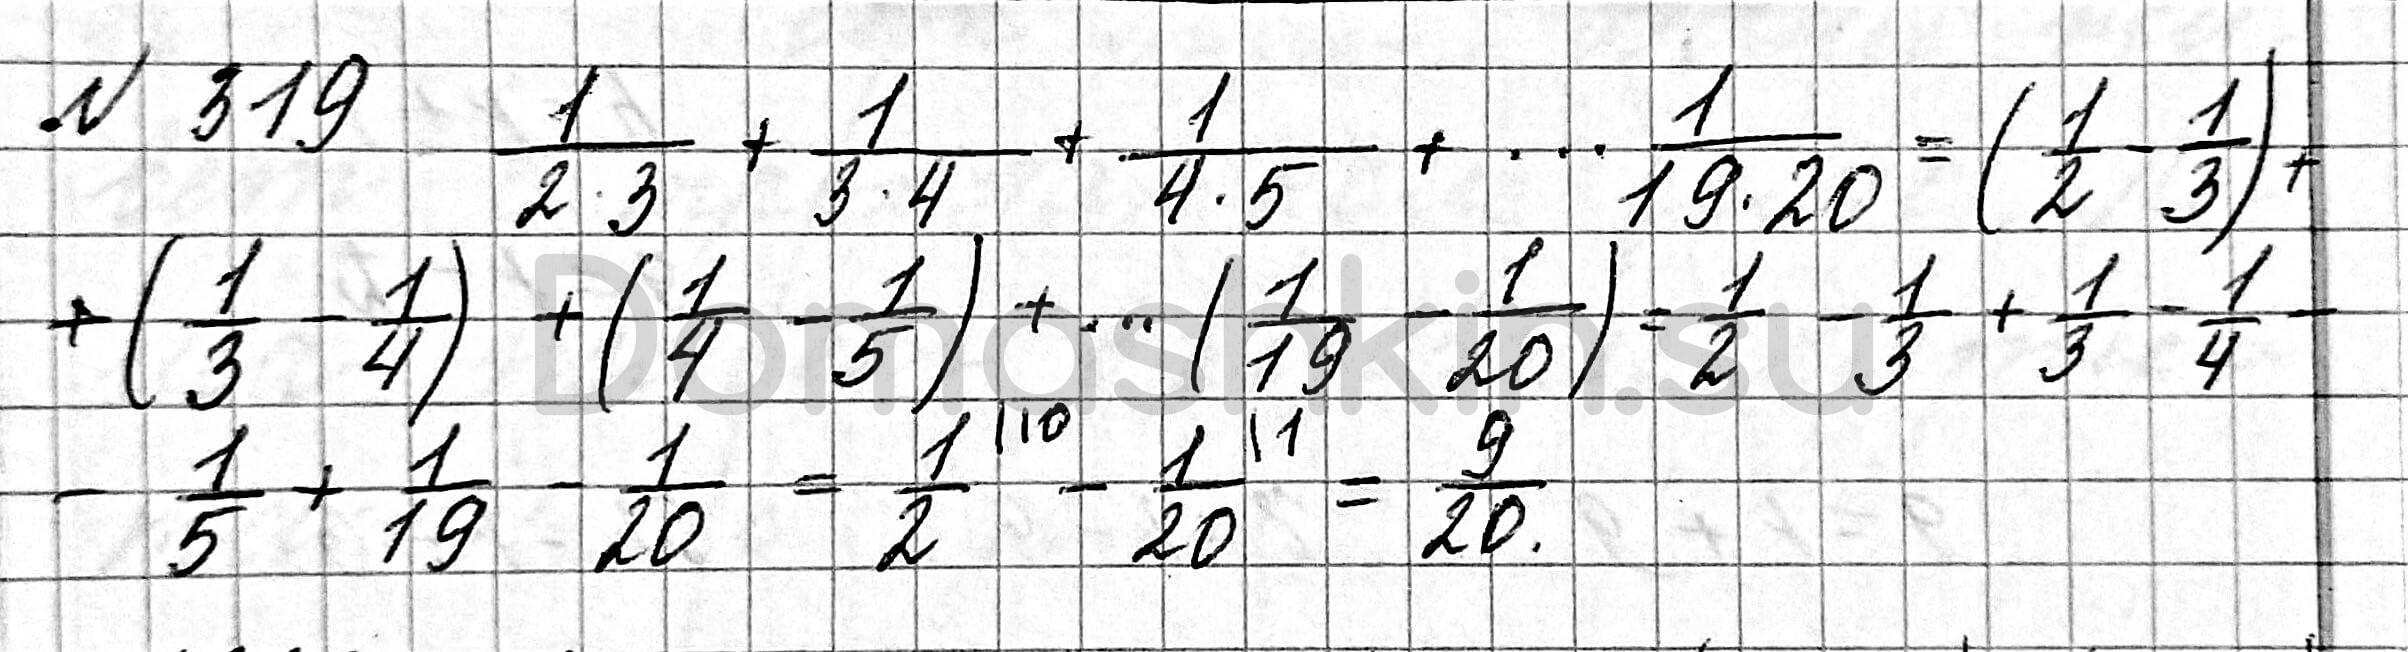 Математика 6 класс учебник Мерзляк номер 319 решение